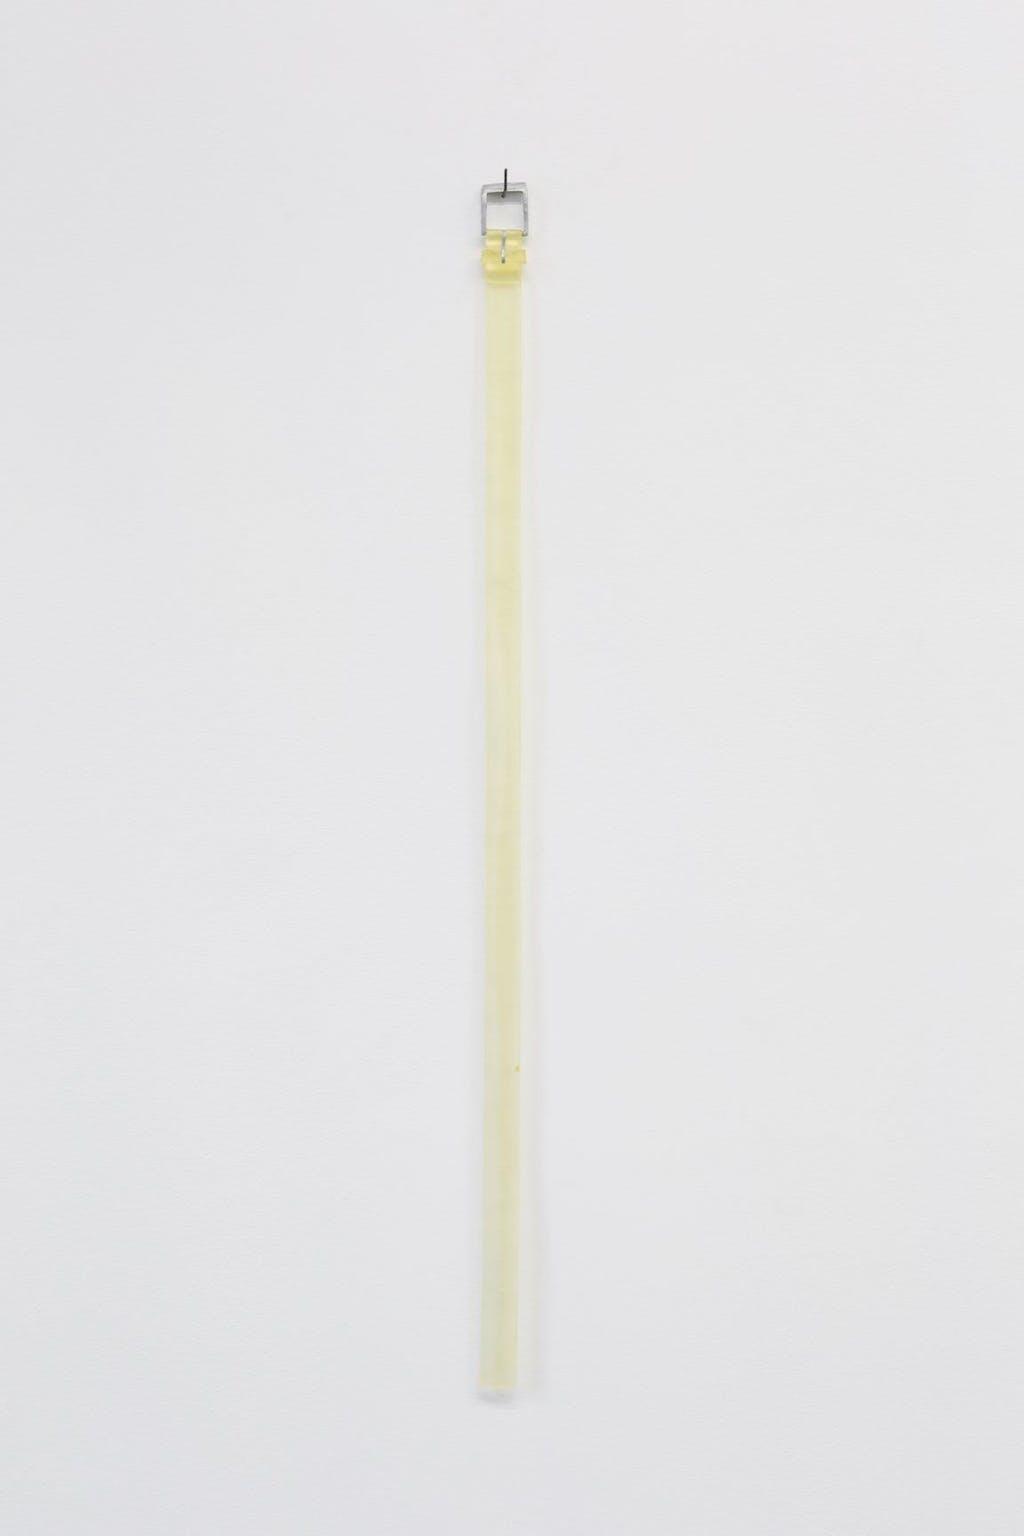 Belt hanging on the wall - © kamel mennour